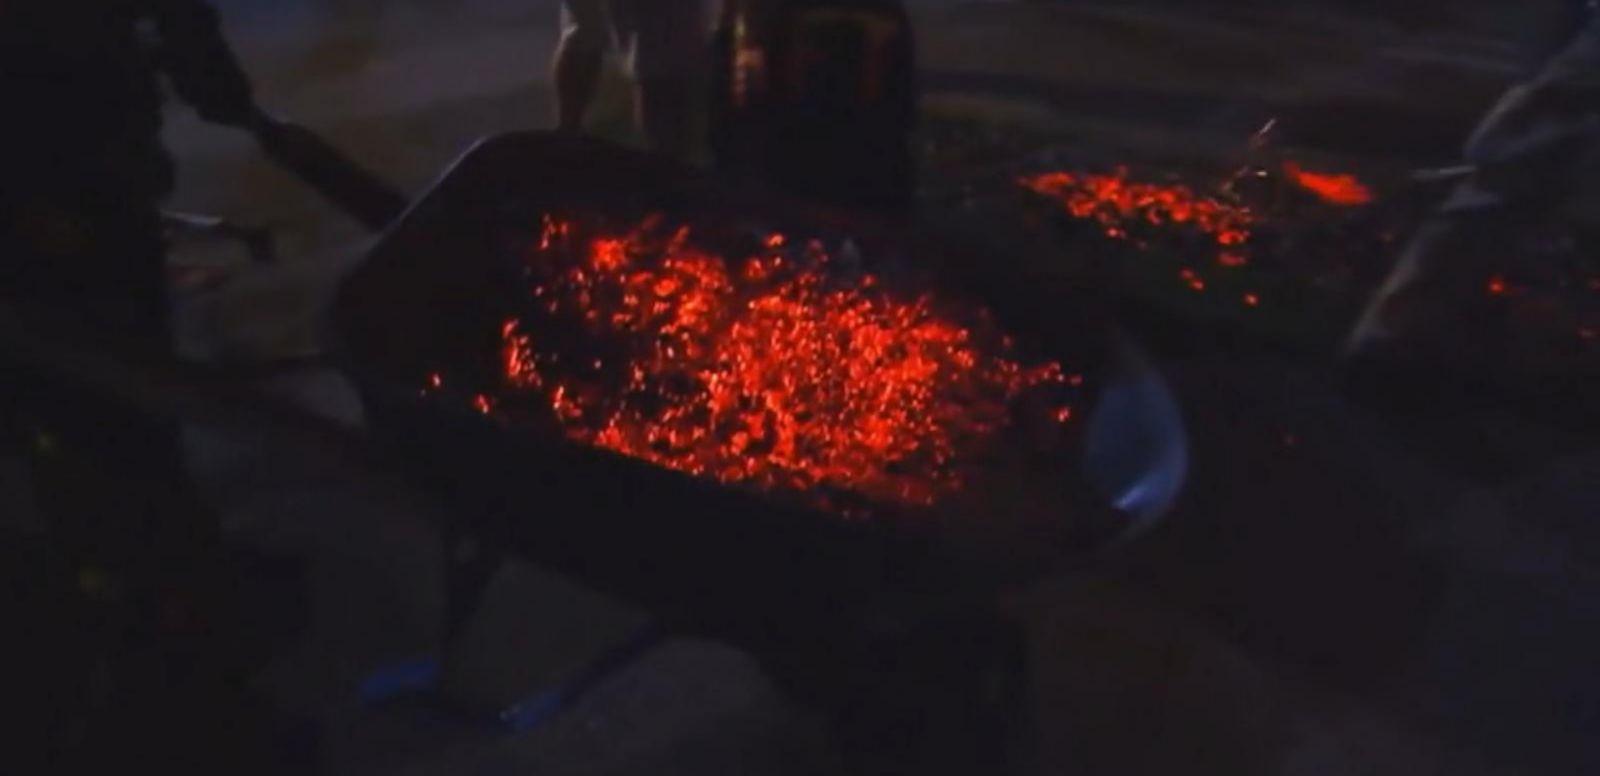 VIDEO: Dozens of People Hurt Walking on Hot Coals at Tony Robbins Event